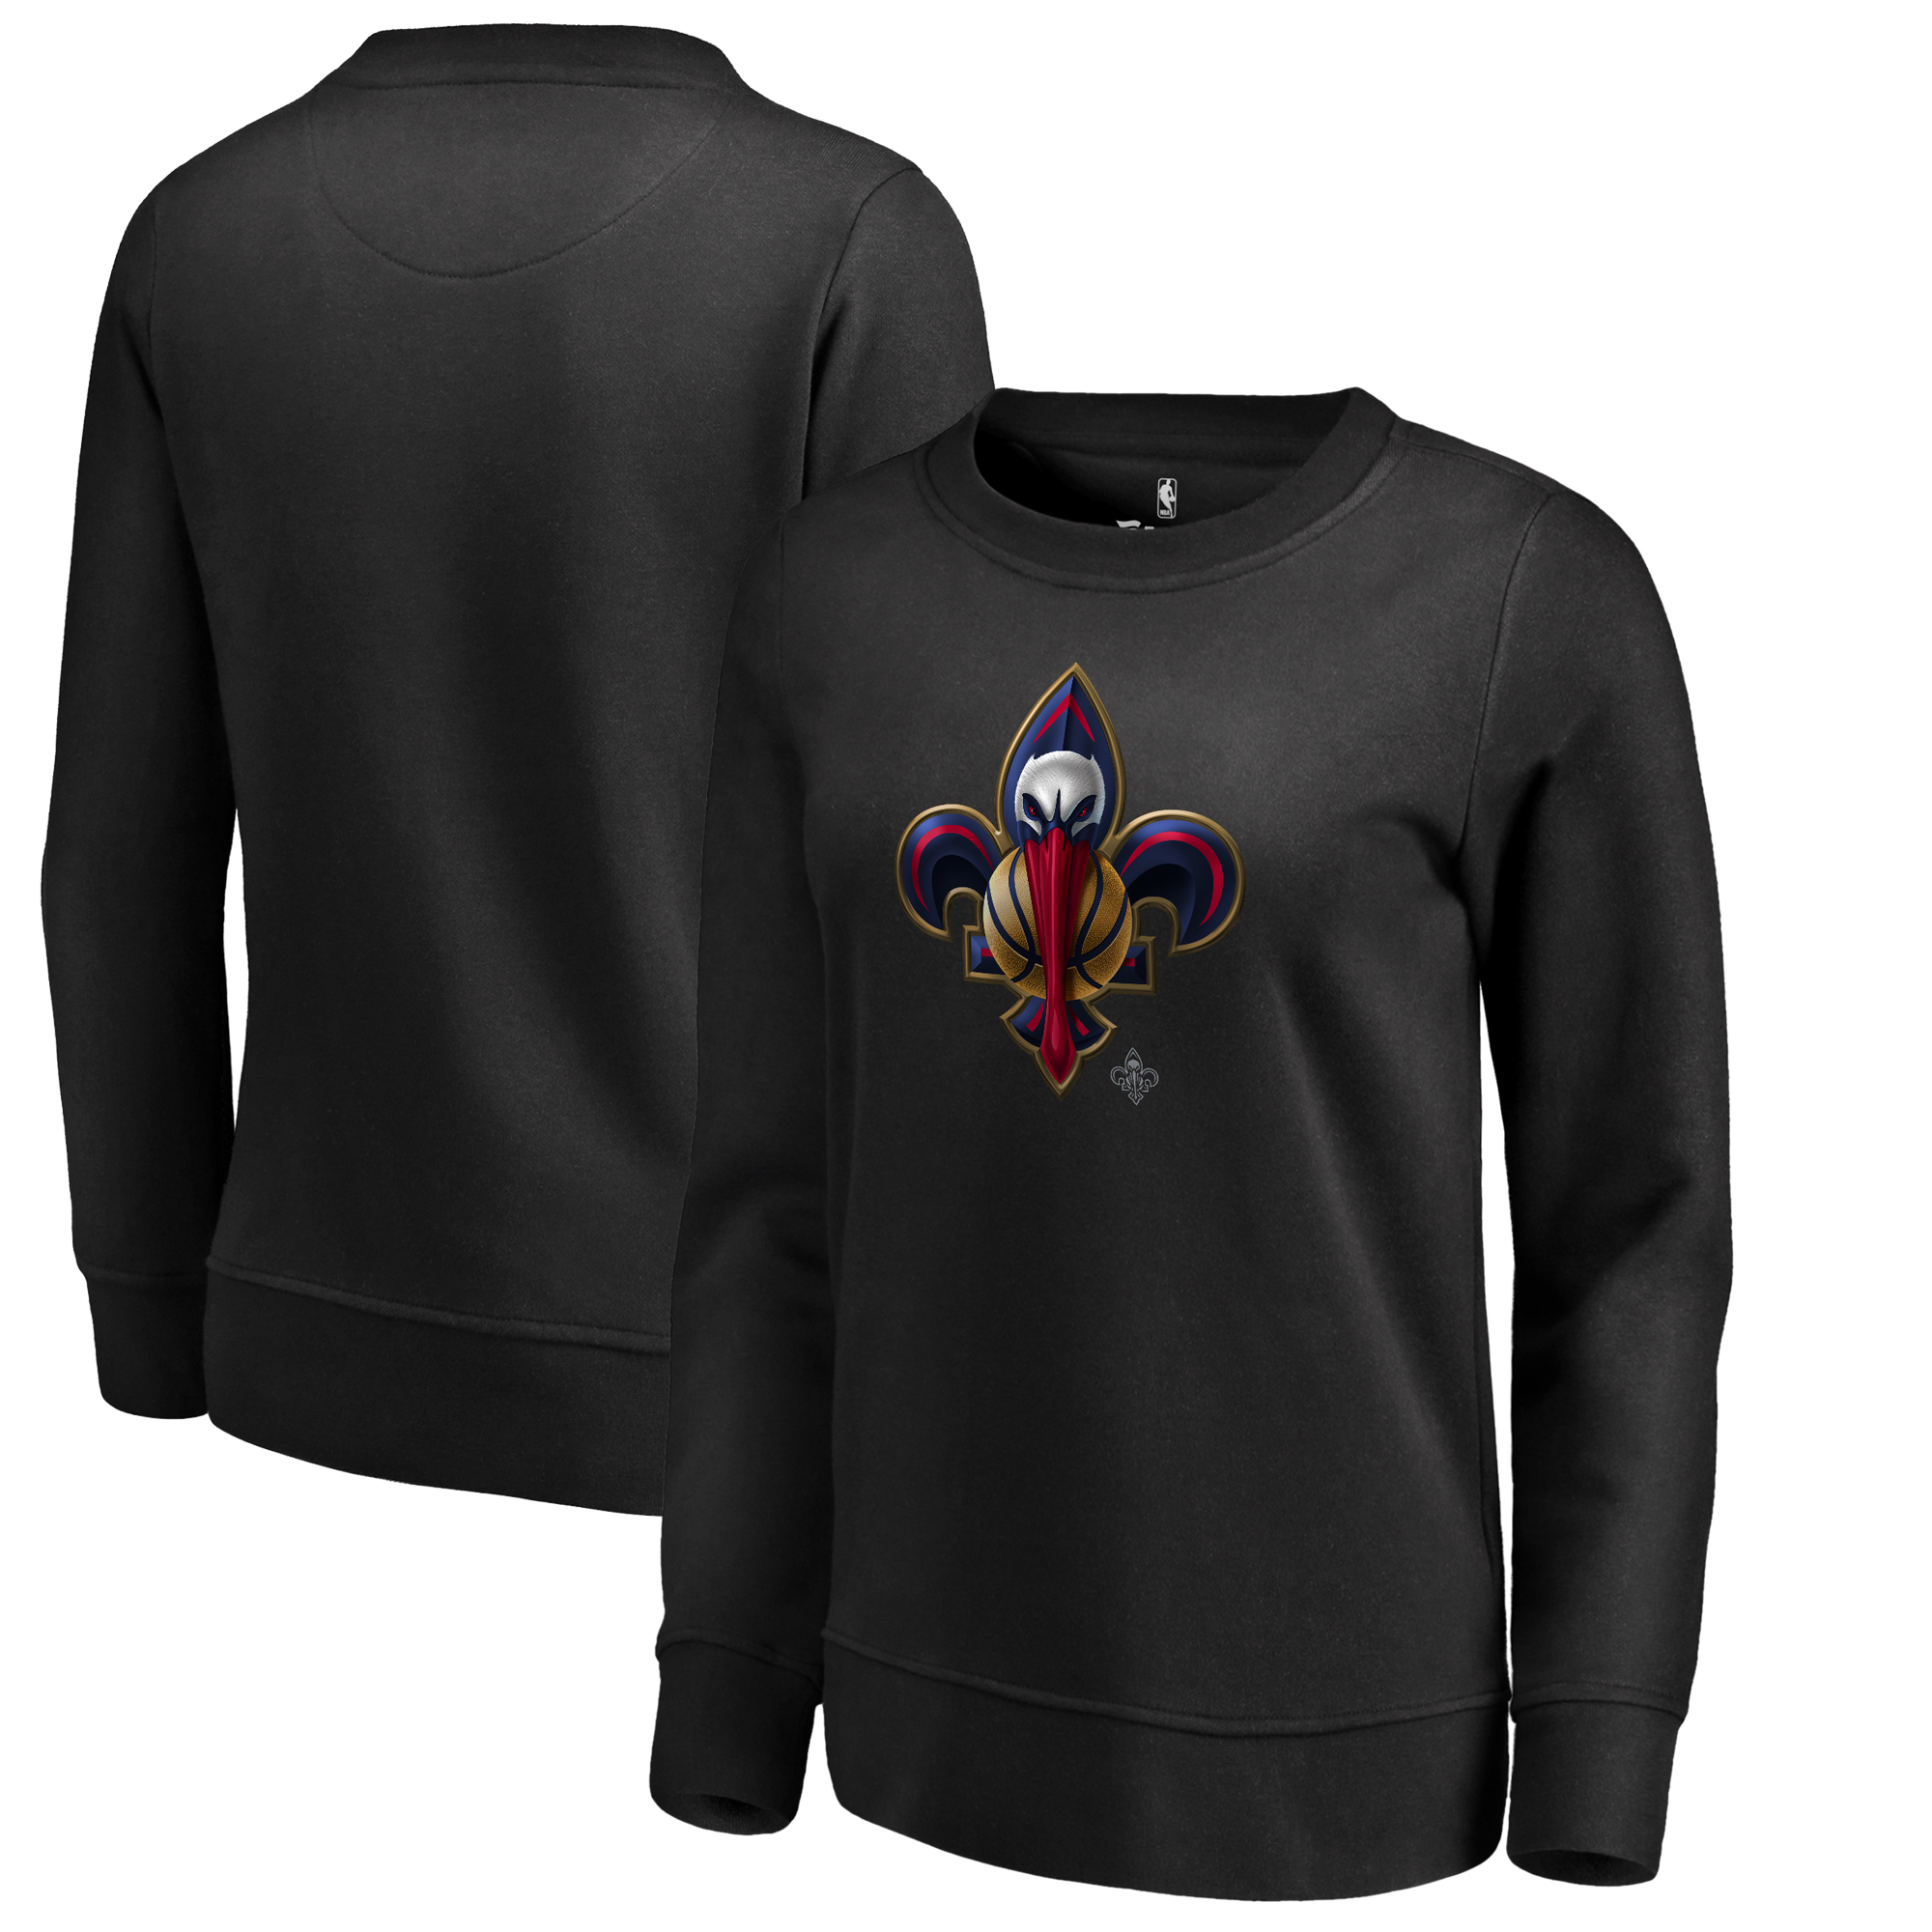 New Orleans Pelicans Fanatics Branded Women's Midnight Mascot Pullover Sweatshirt - Black